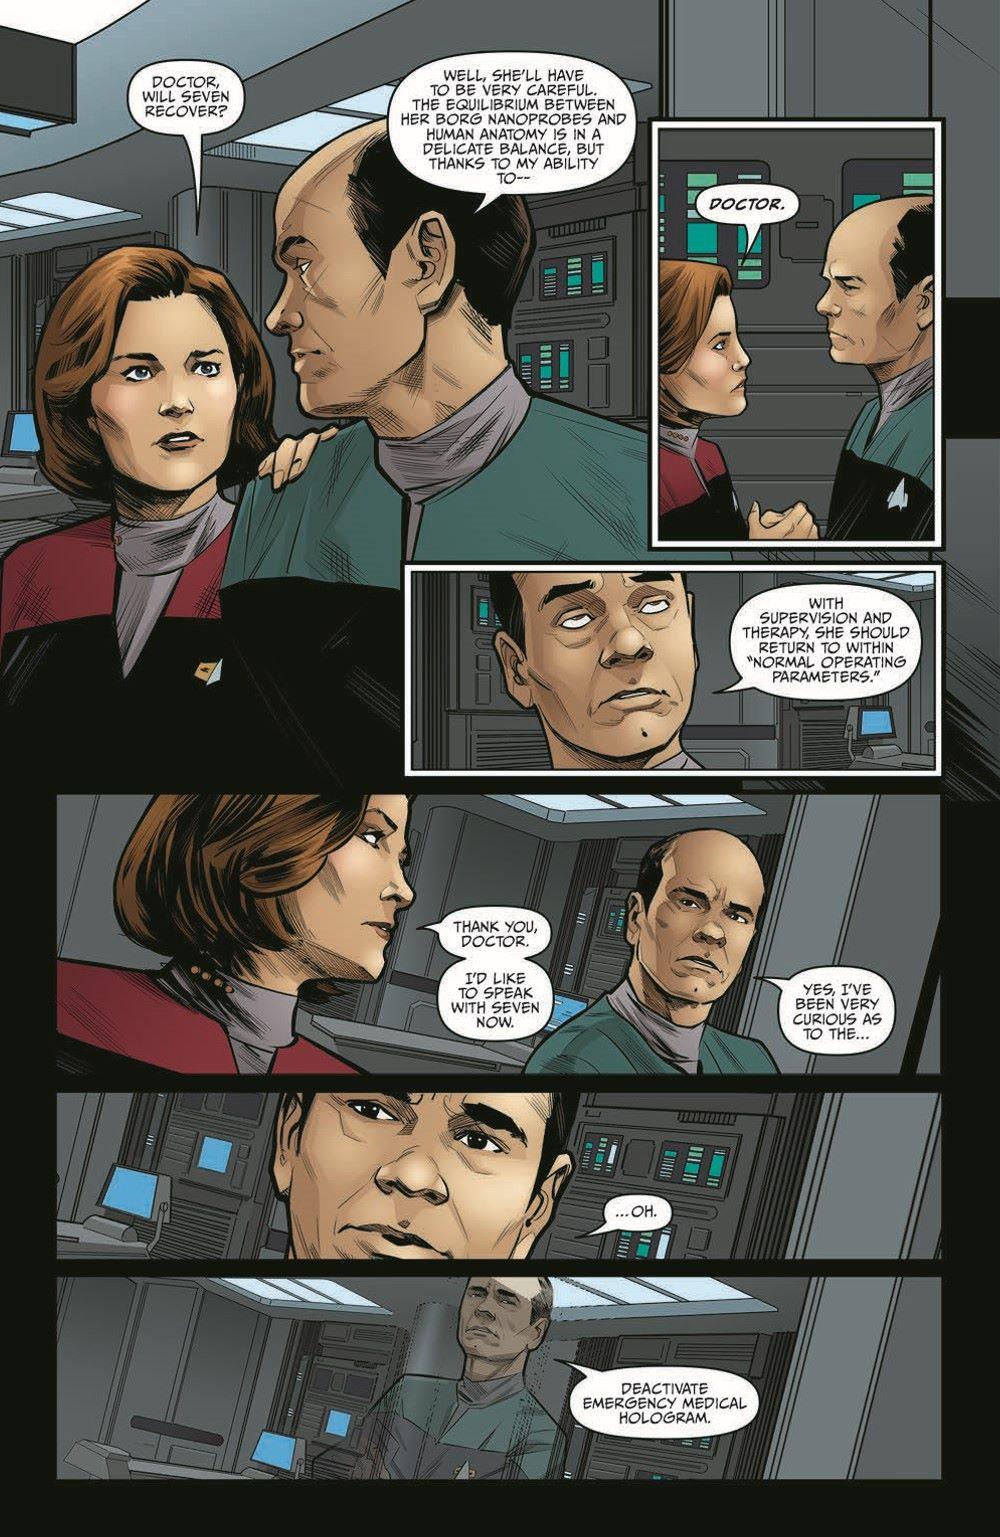 ST_Voyager_SR04-pr-7 ComicList Previews: STAR TREK VOYAGER SEVEN'S RECKONING #4 (OF 4)